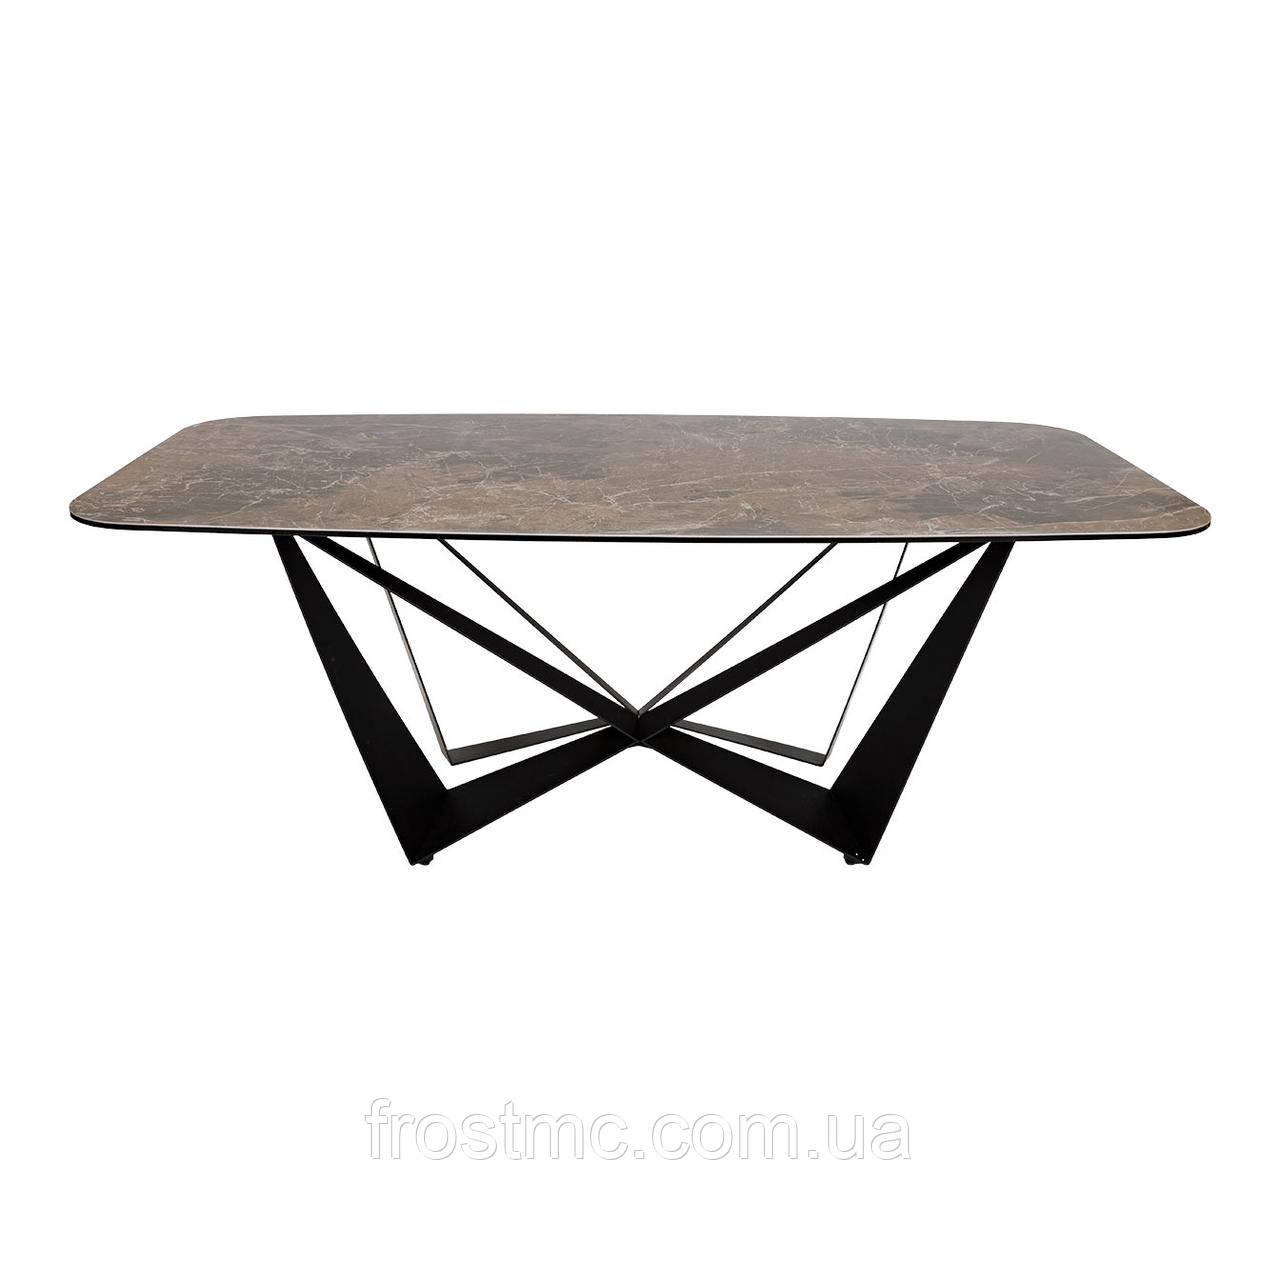 Стол Nicolas Wellington HT92015В 200 керамика коричневый